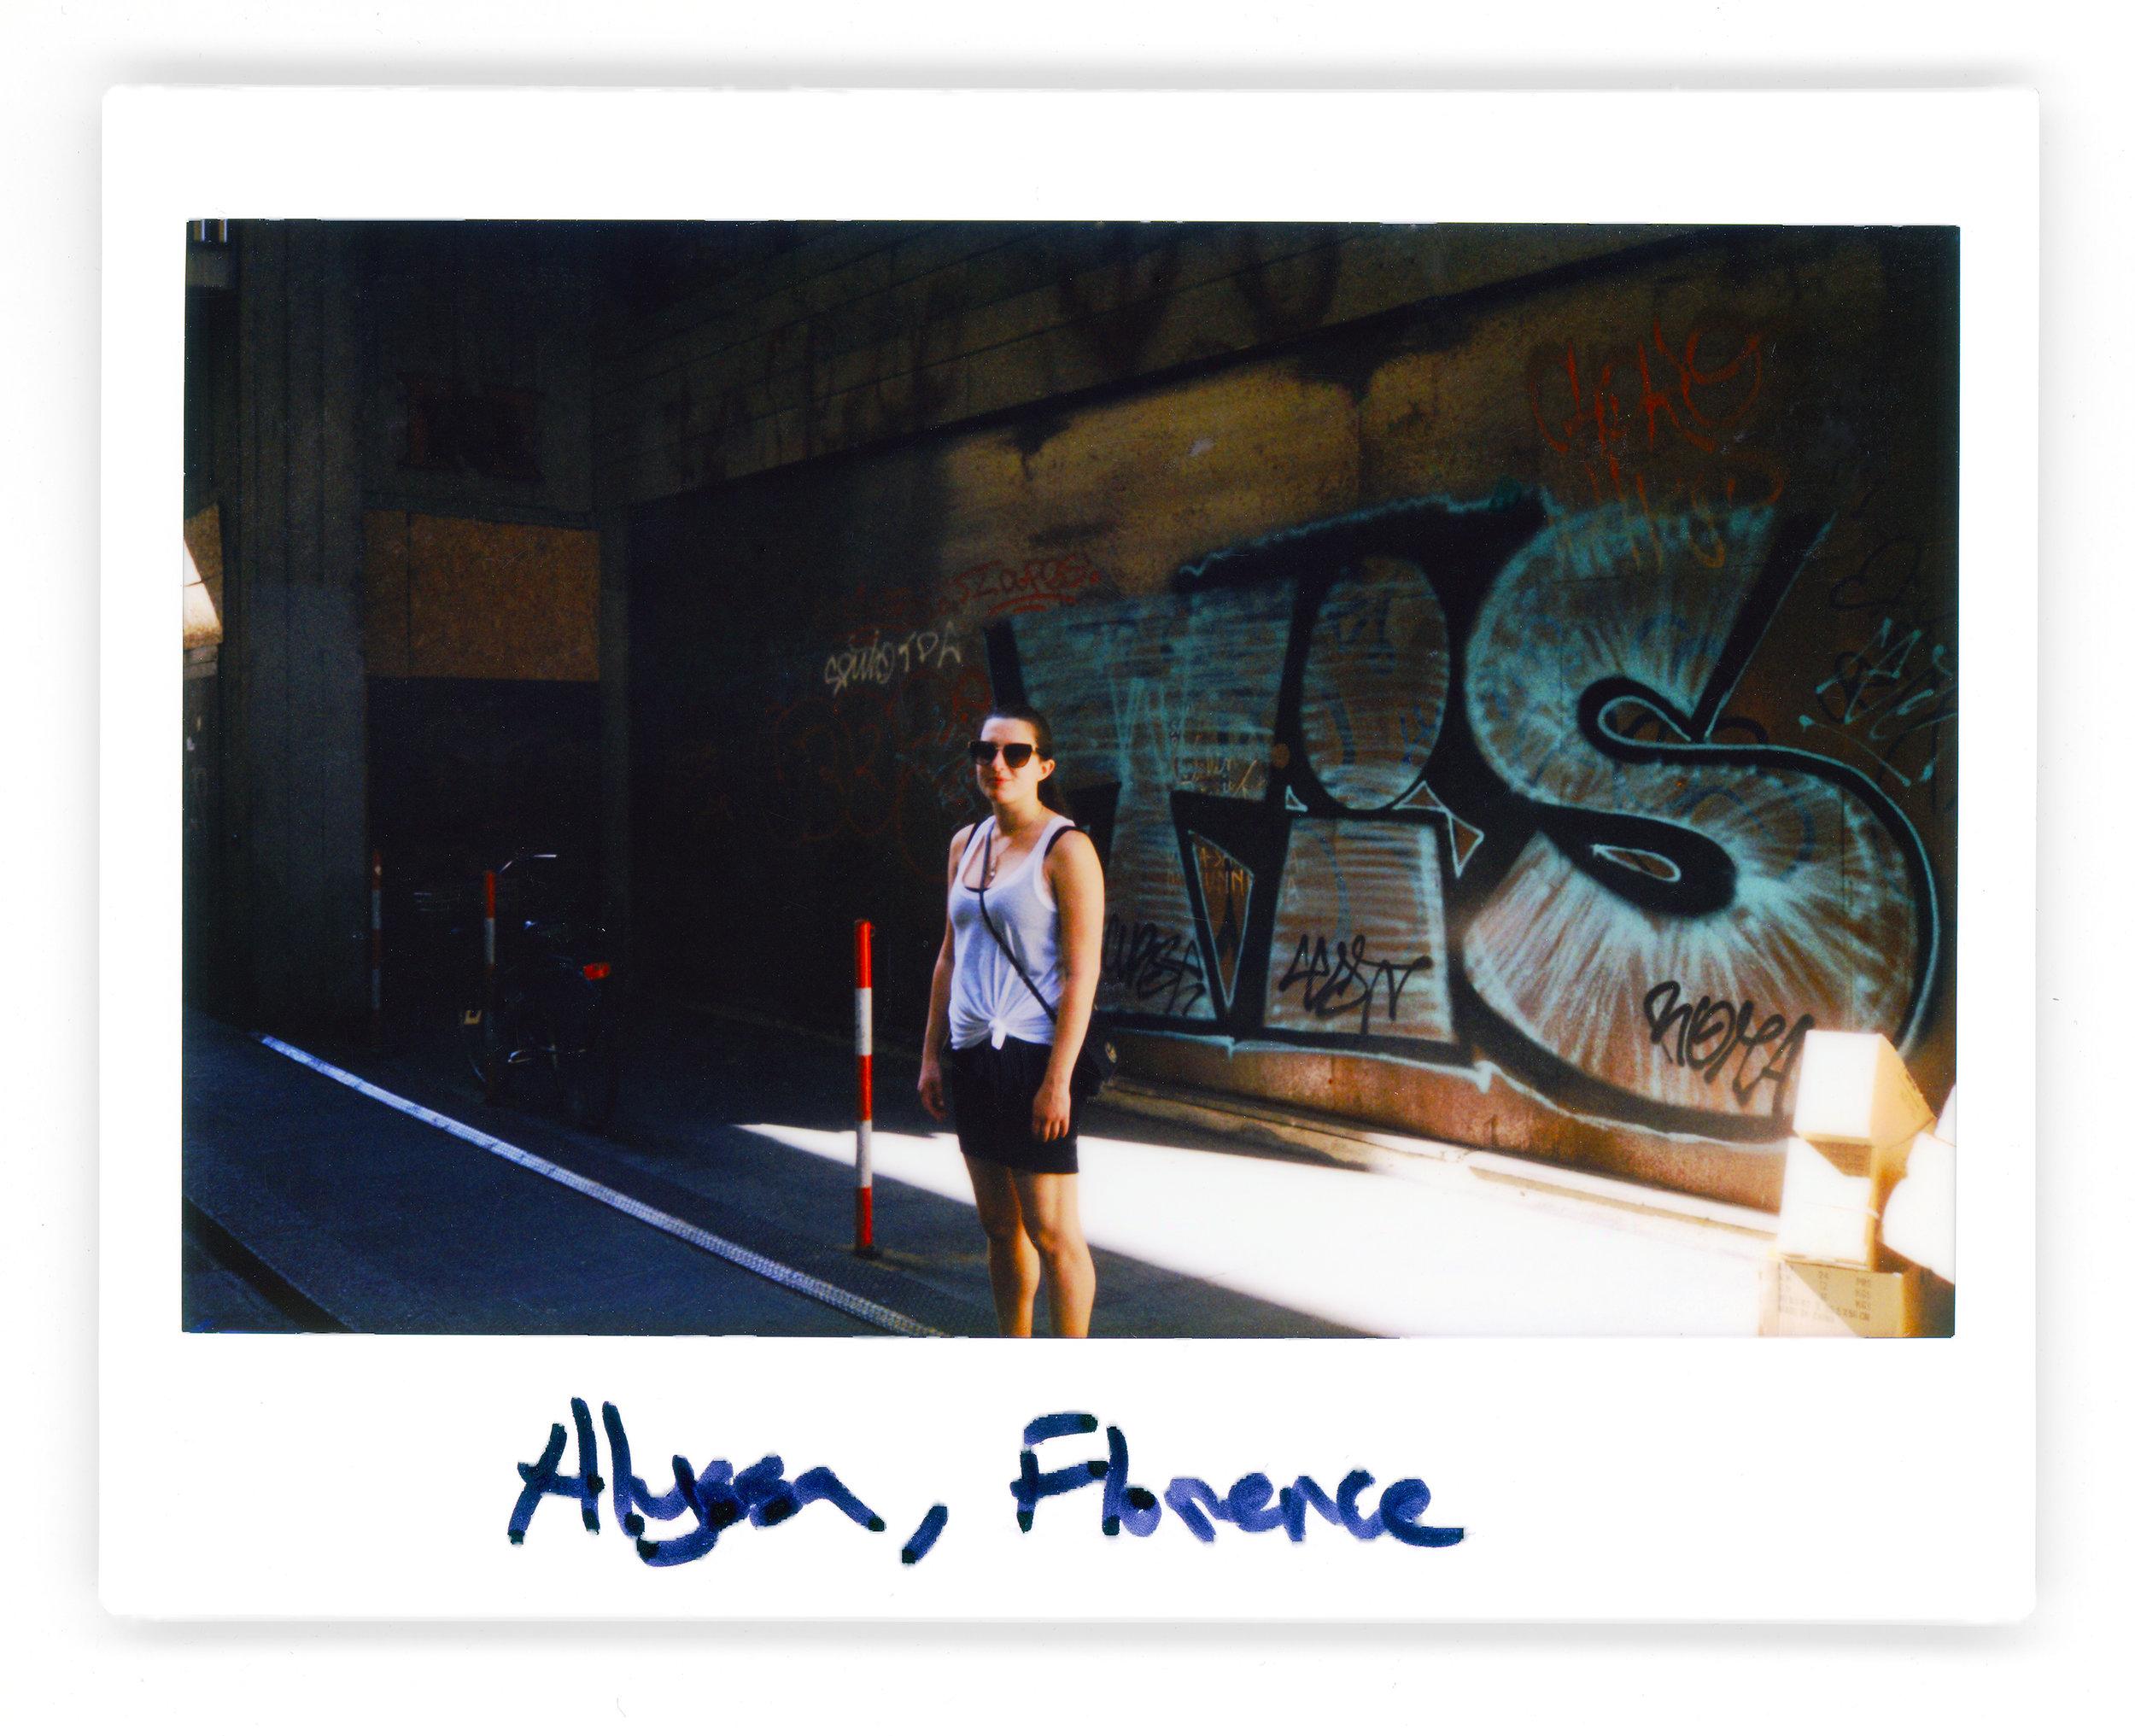 09_Alyssa_florence copy.jpg